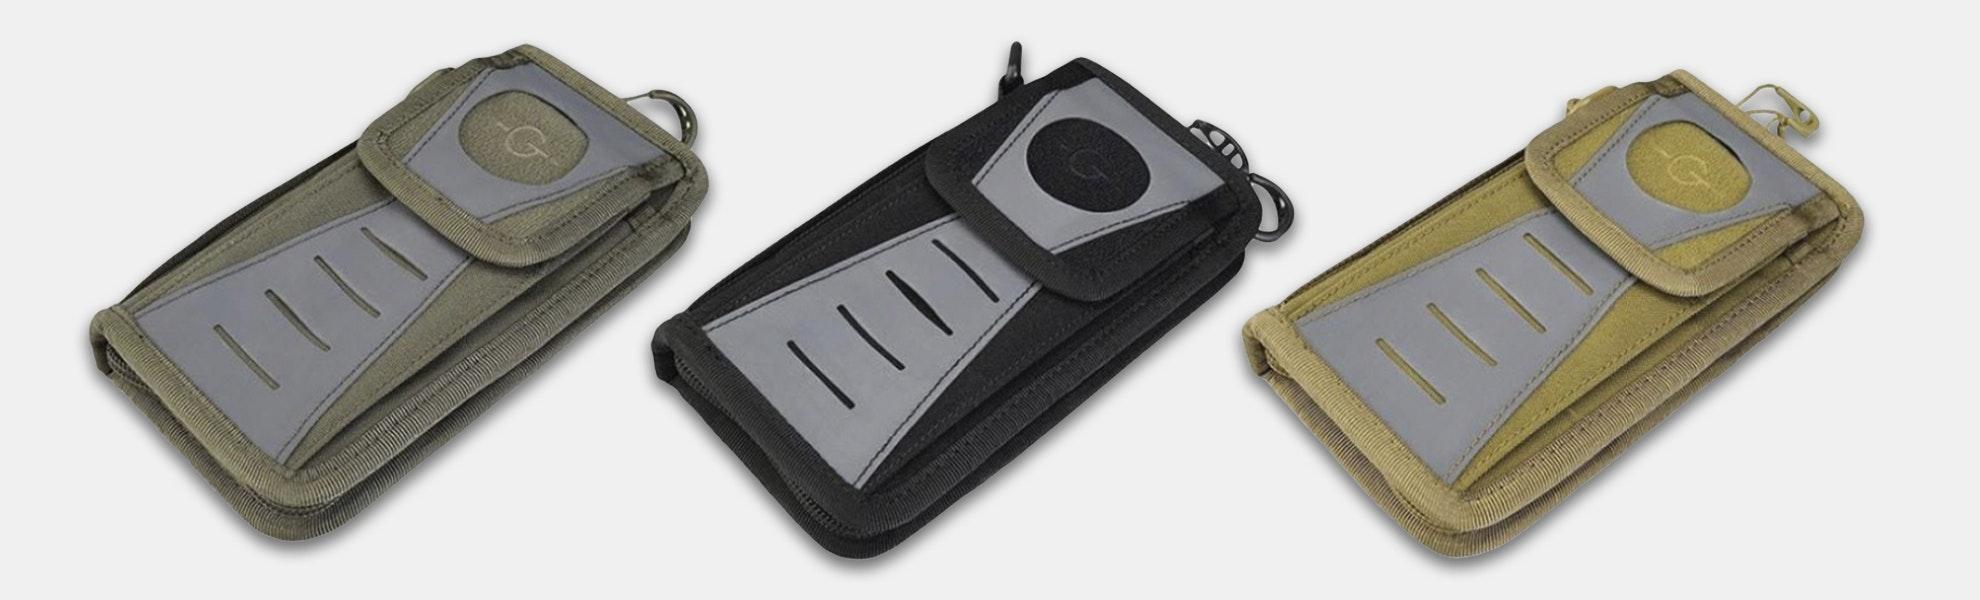 Tactical_Geek Block D Multifunction EDC Wallet